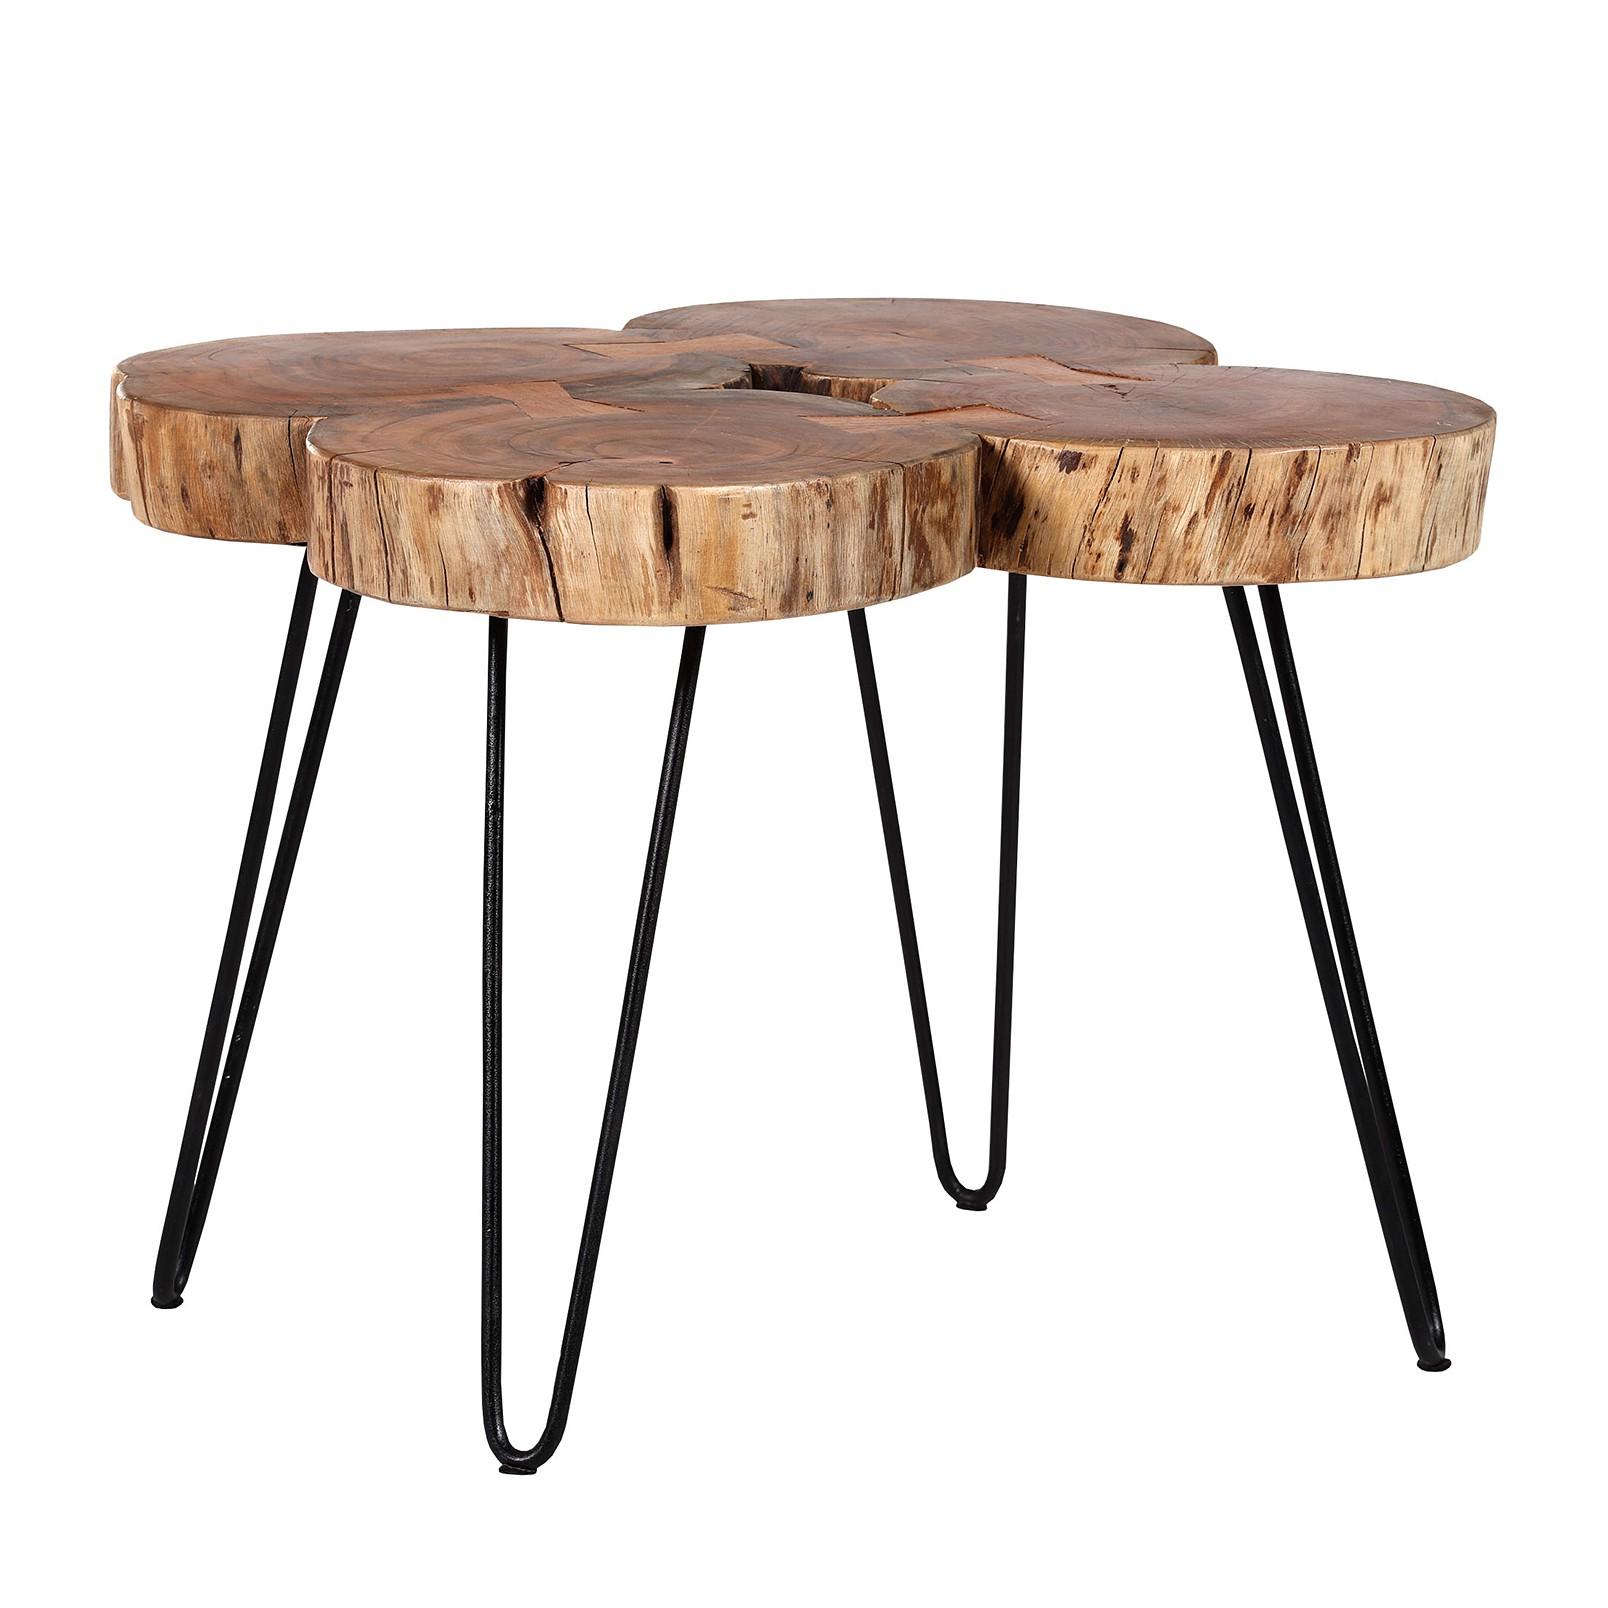 Table d'appoint Mecco II - Acacia massif / Fer - Acacia / Noir, ars manufacti